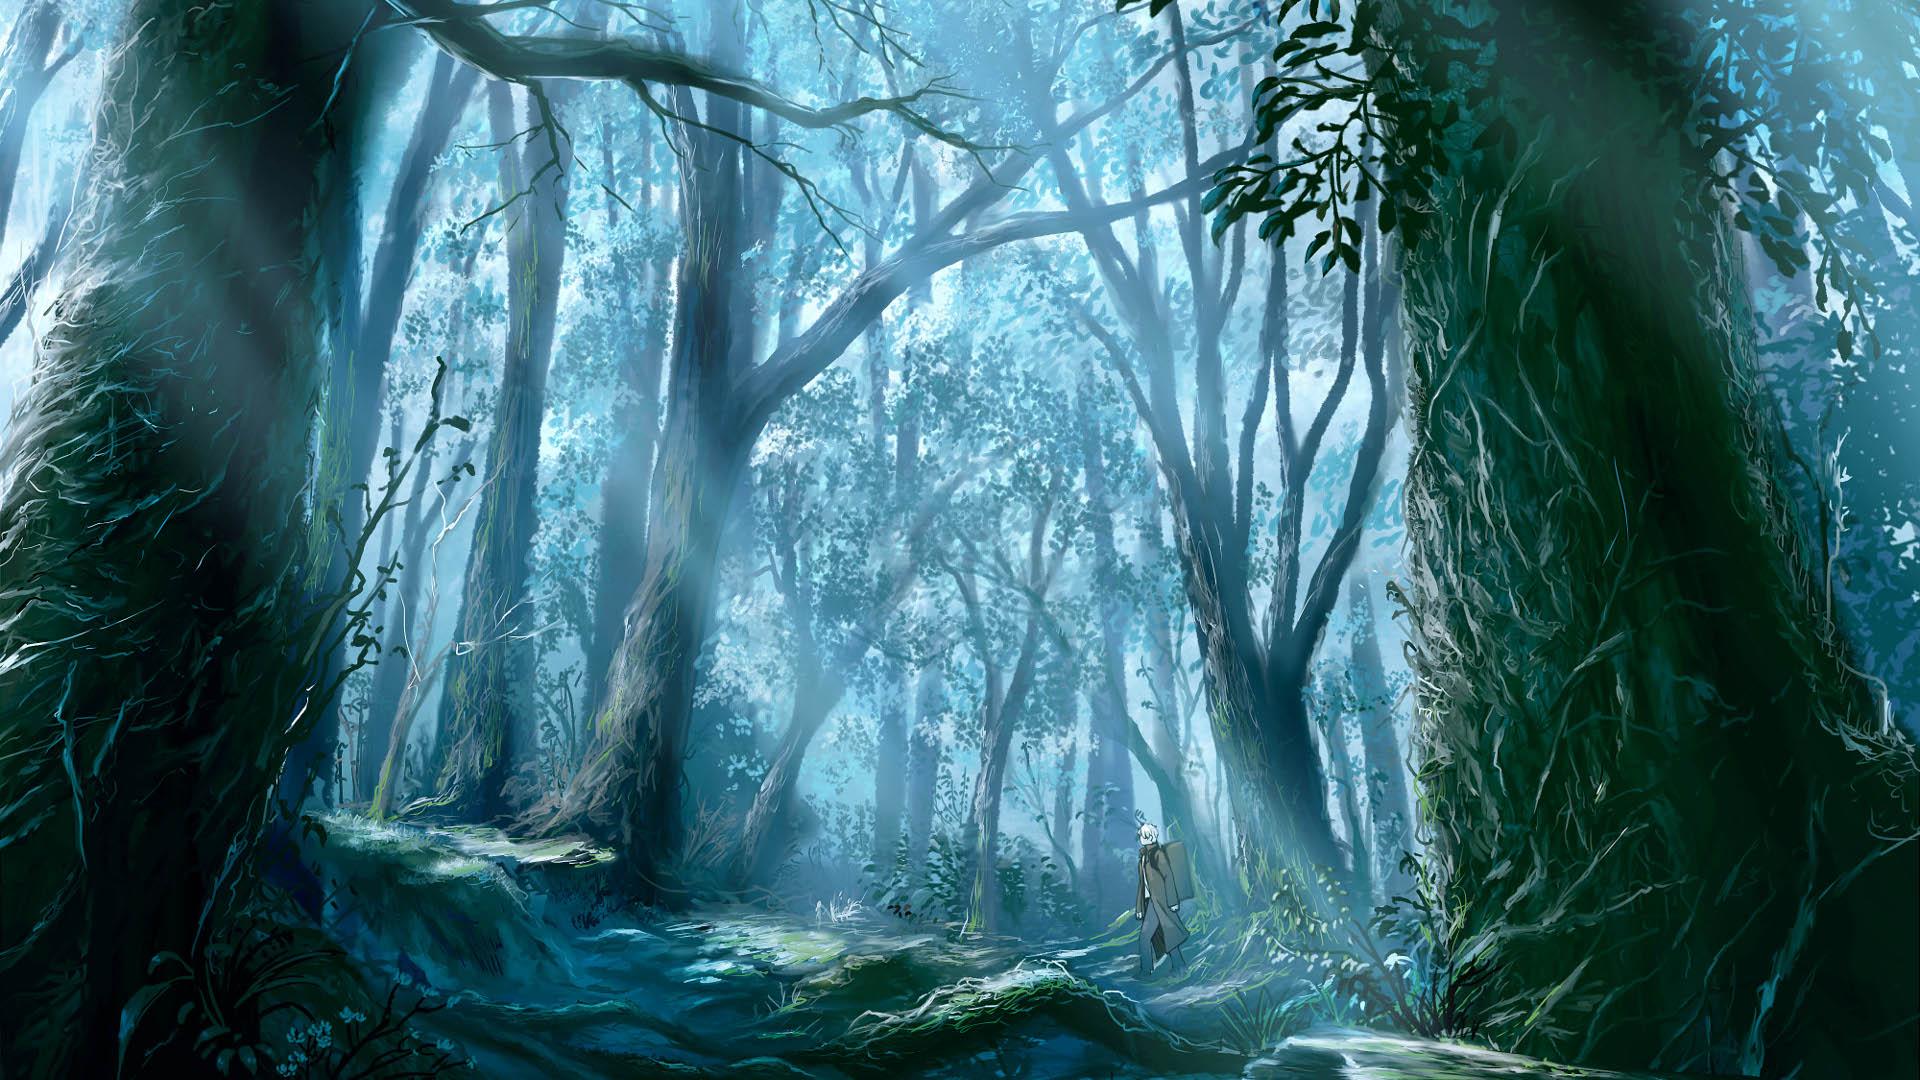 Download Anime Forest Wallpaper 1920x1080 Wallpoper 175083 1920x1080